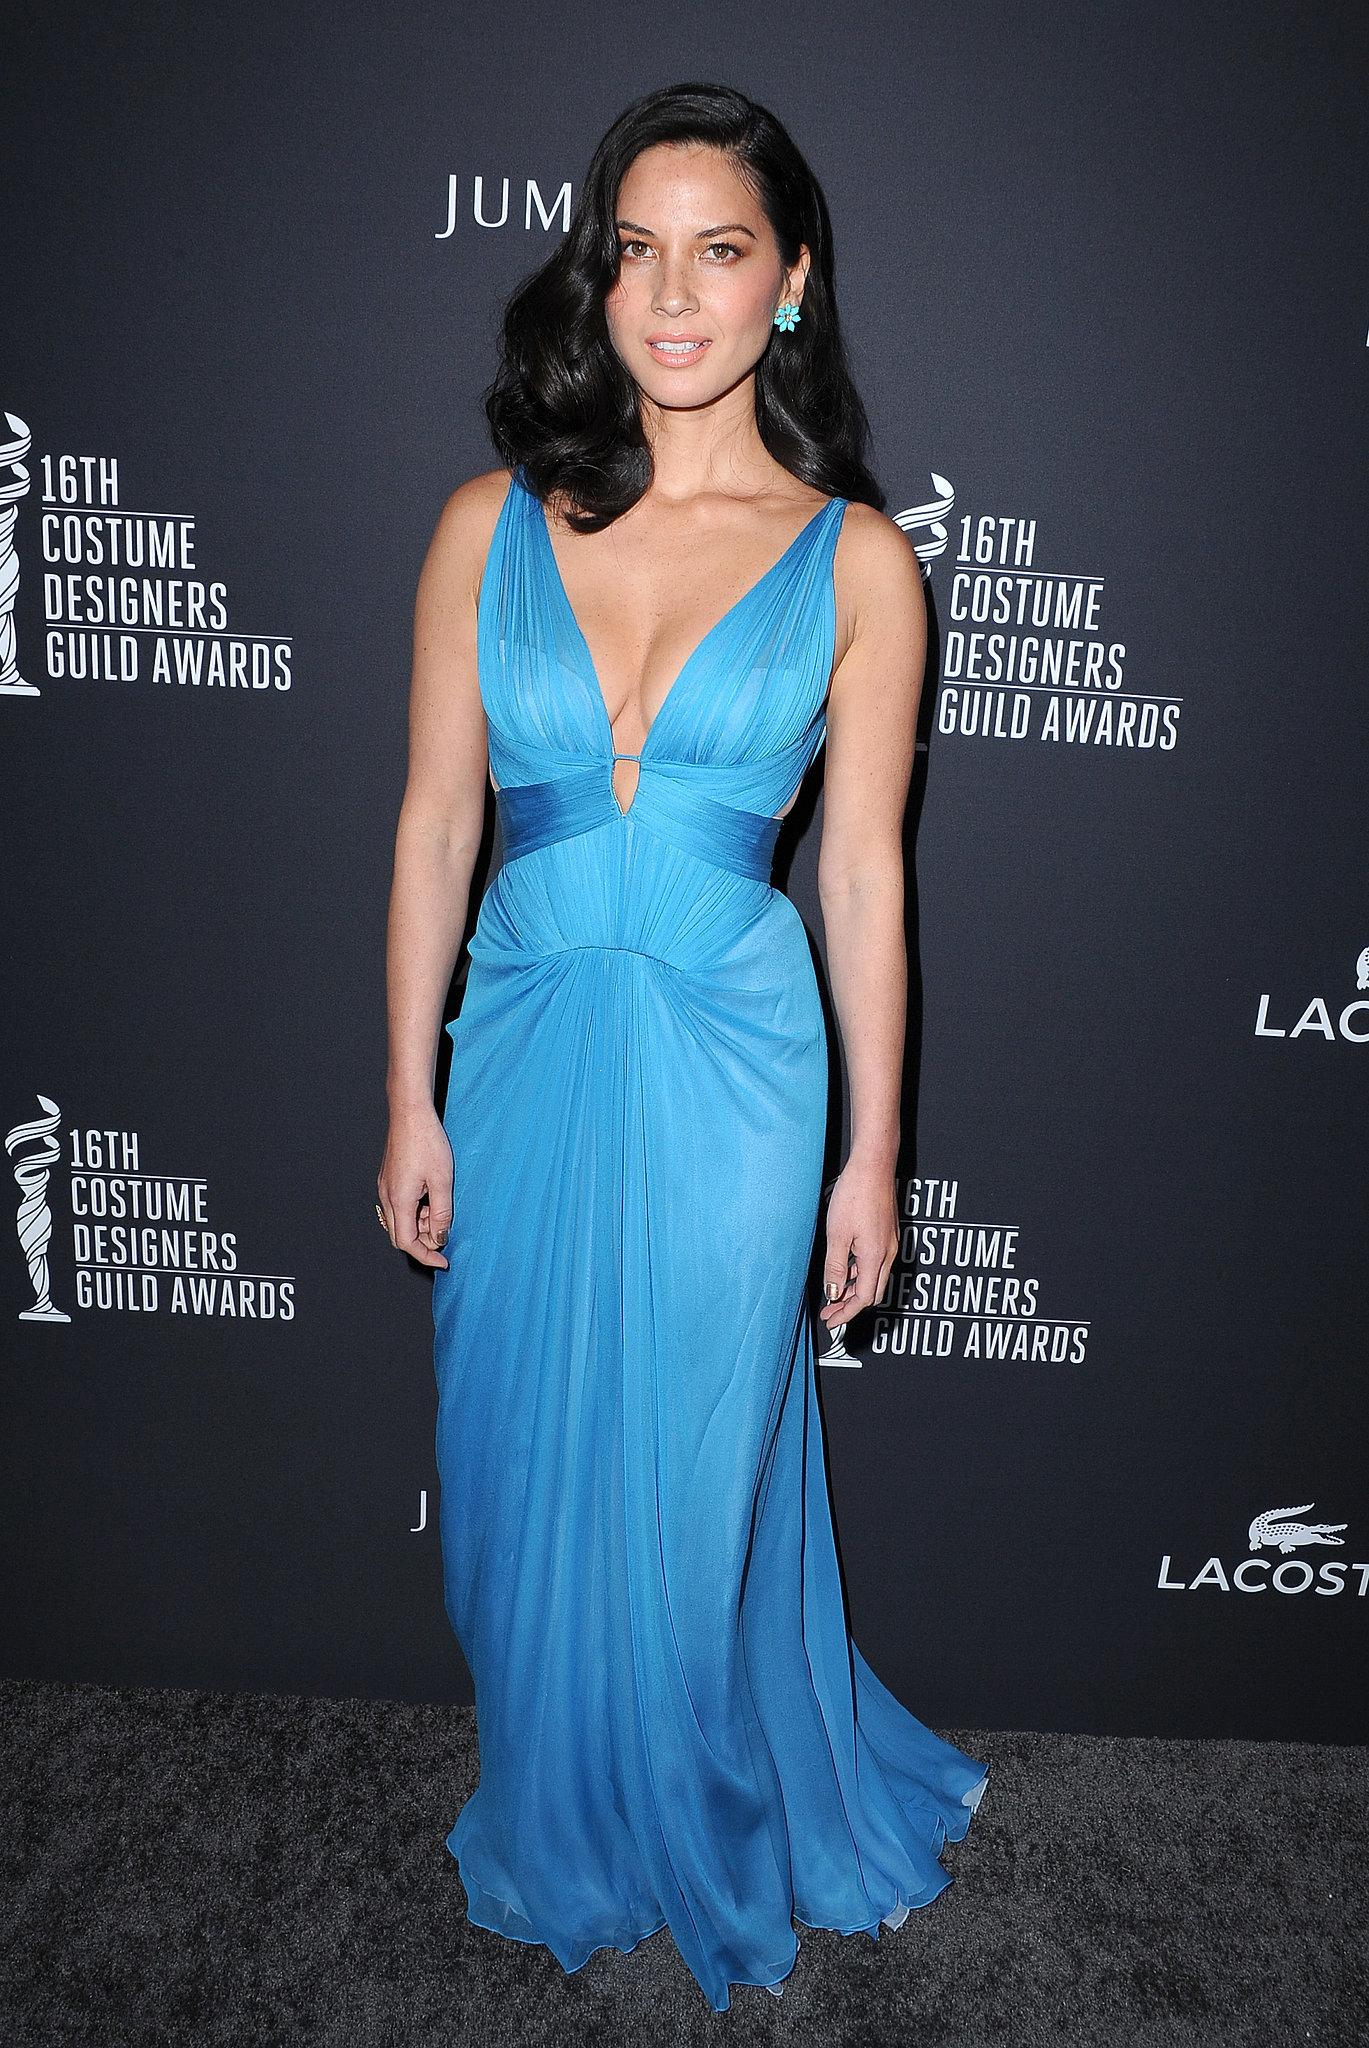 Olivia Munn at the Costume Designers Guild Awards